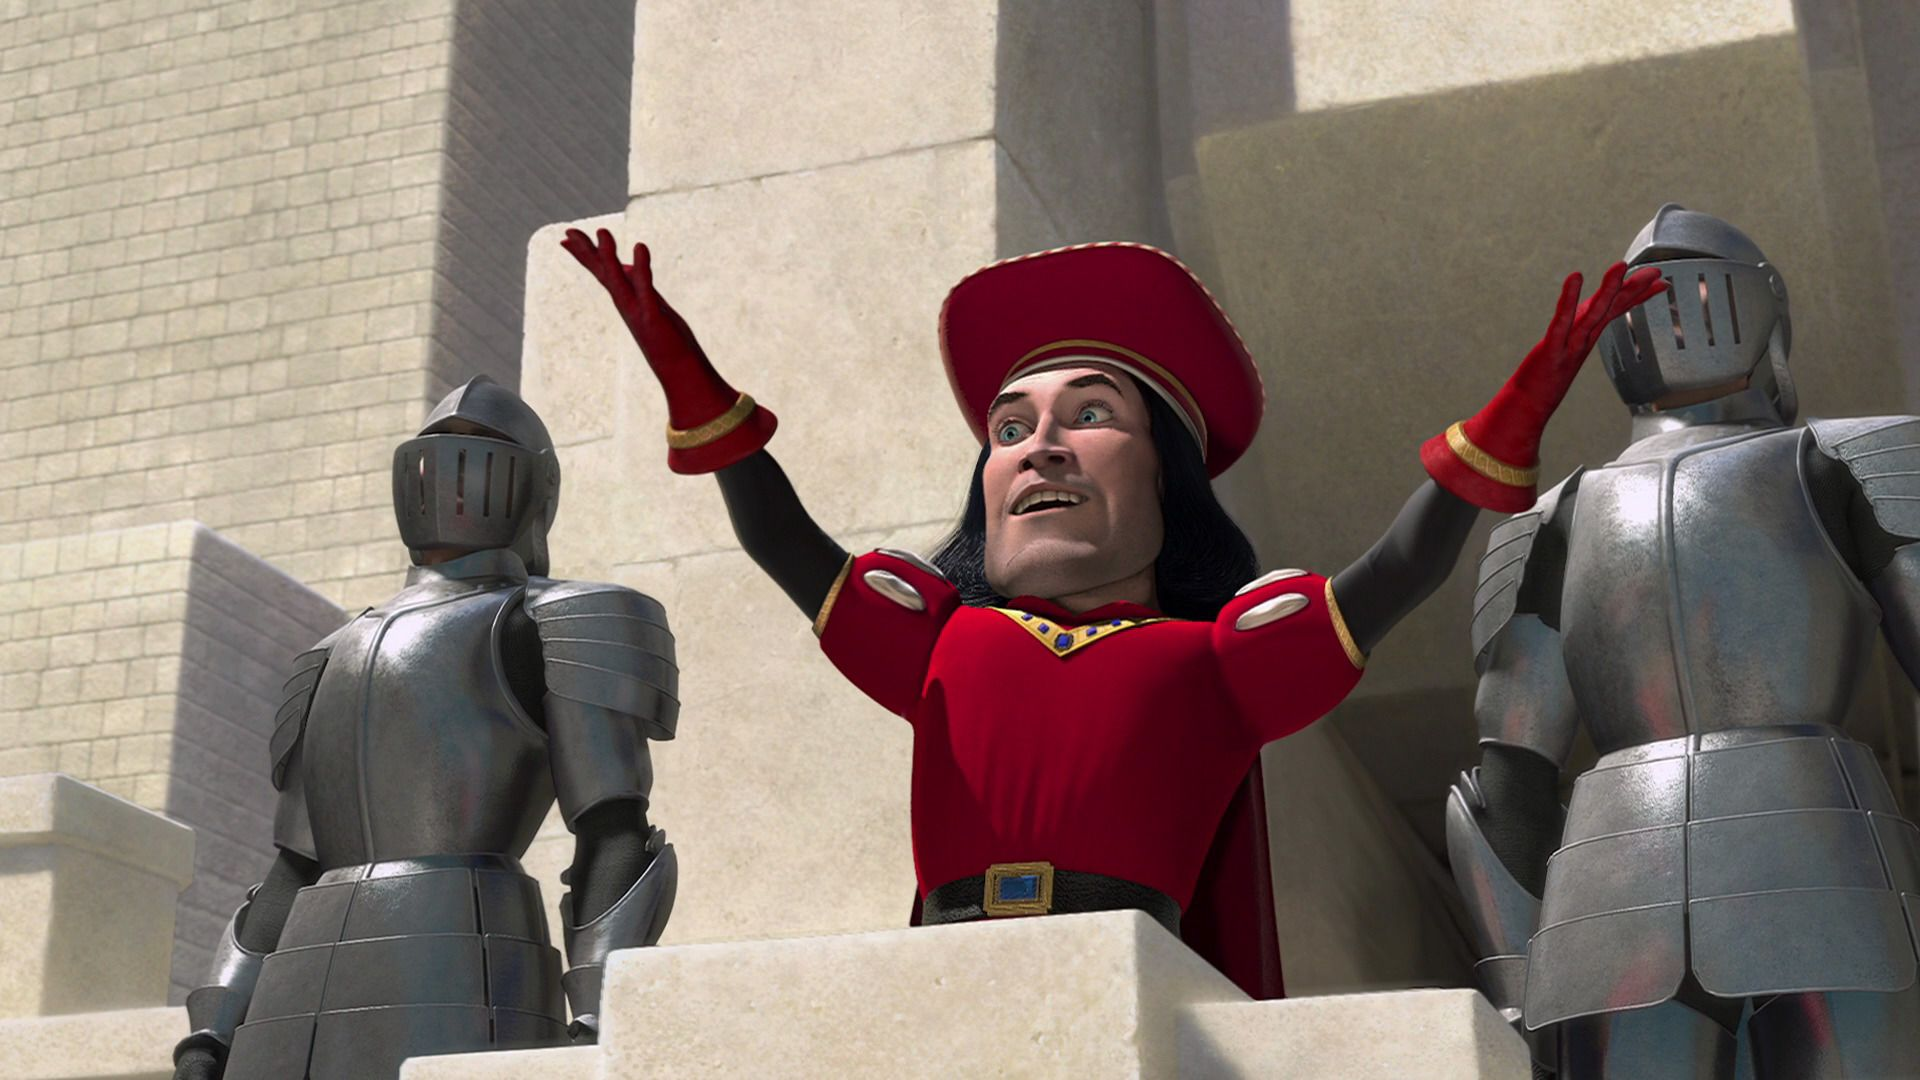 Shreak Lord Farquaad